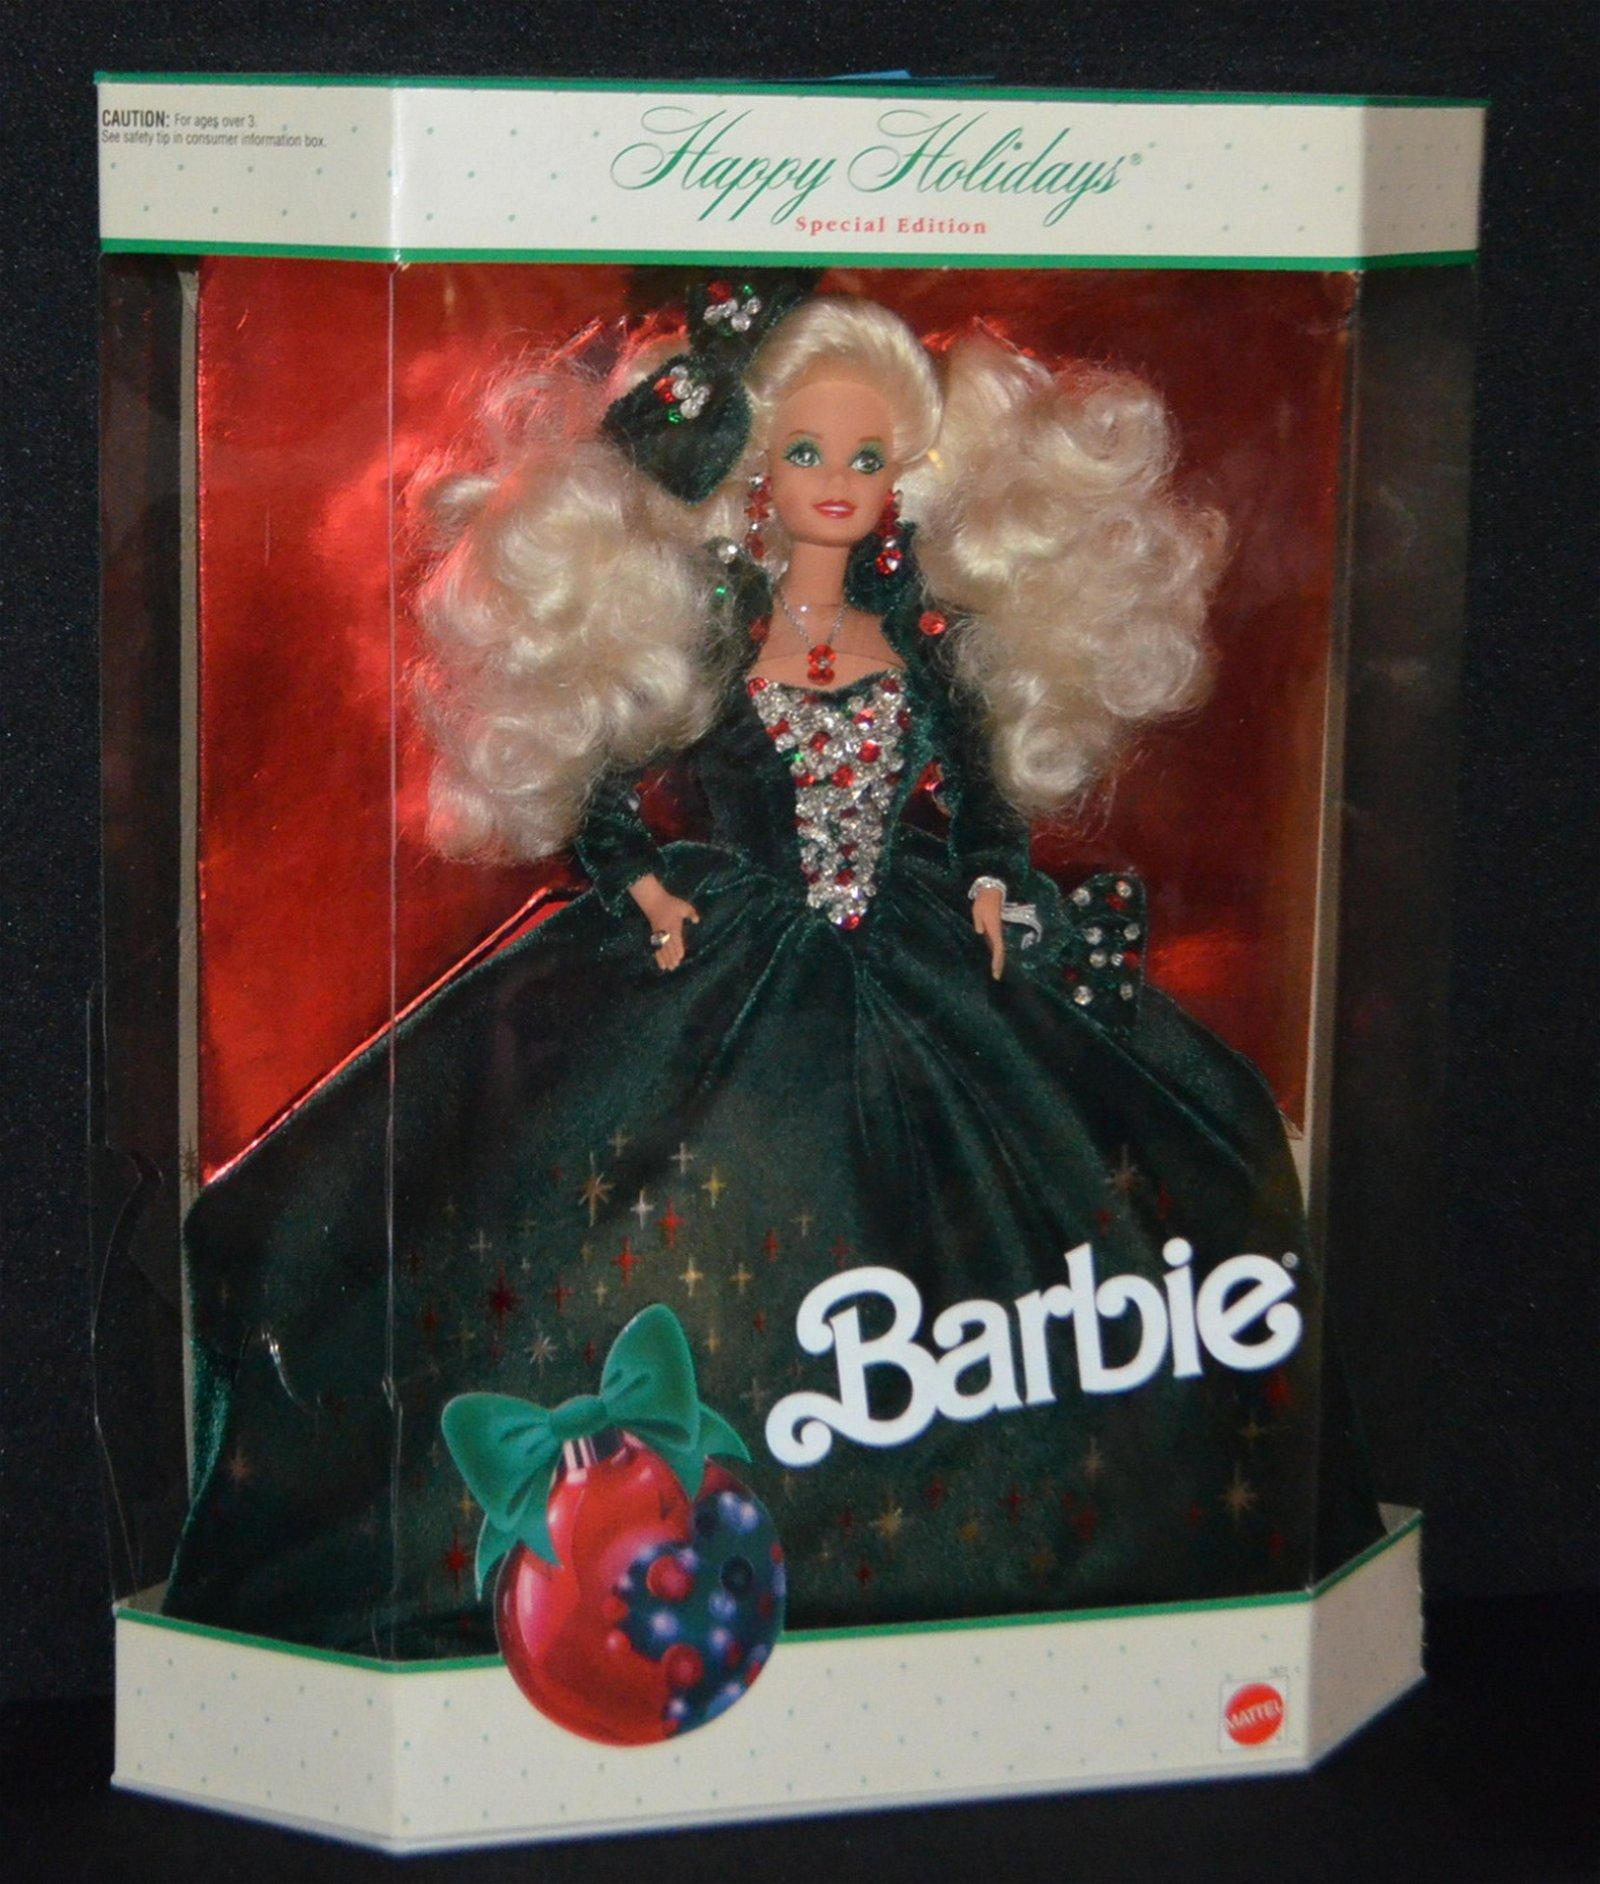 1991 Holiday Barbie Doll, NRFB